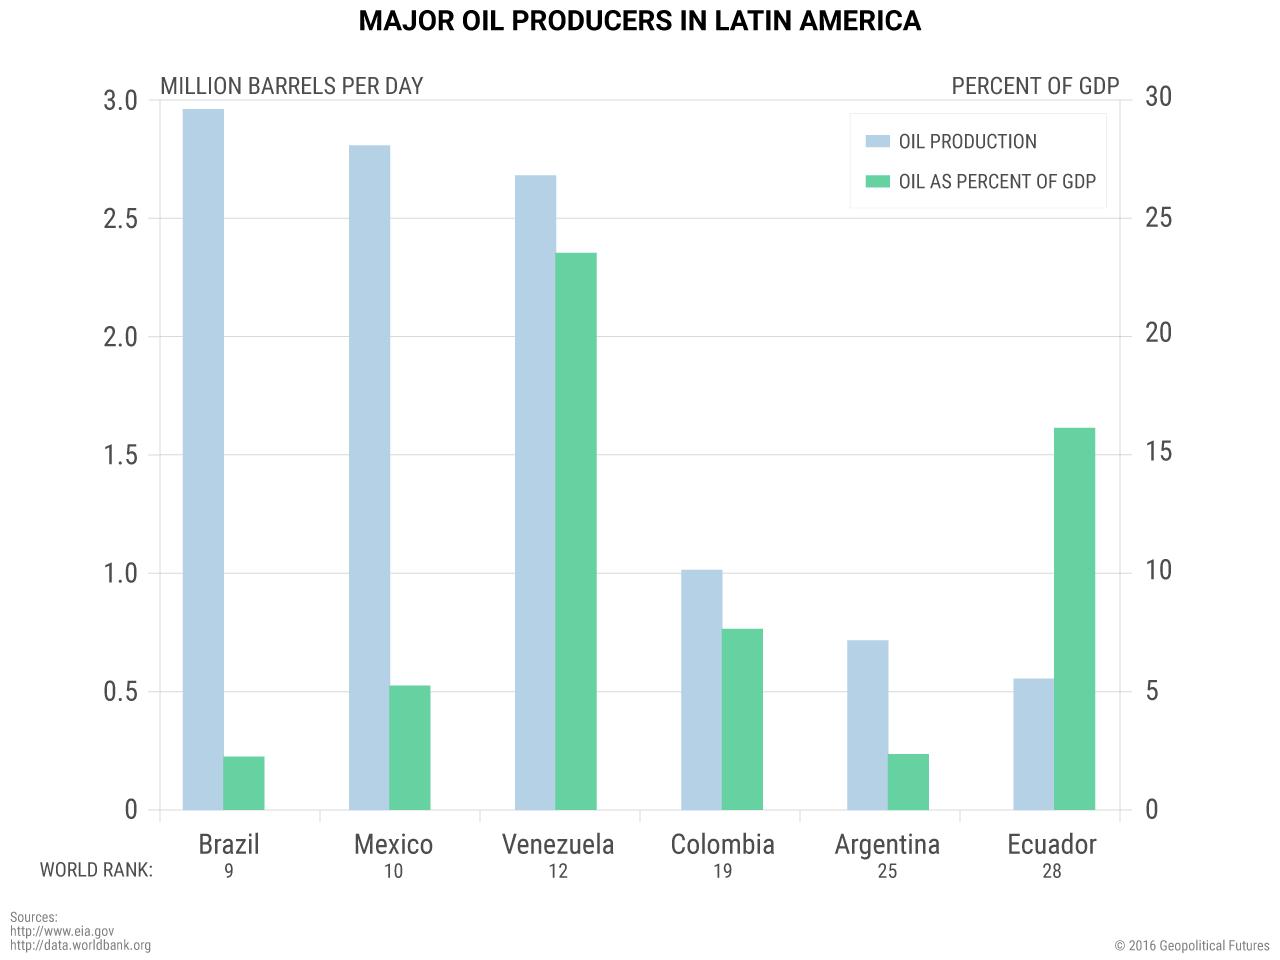 latam-major-oil-producers-latin-america